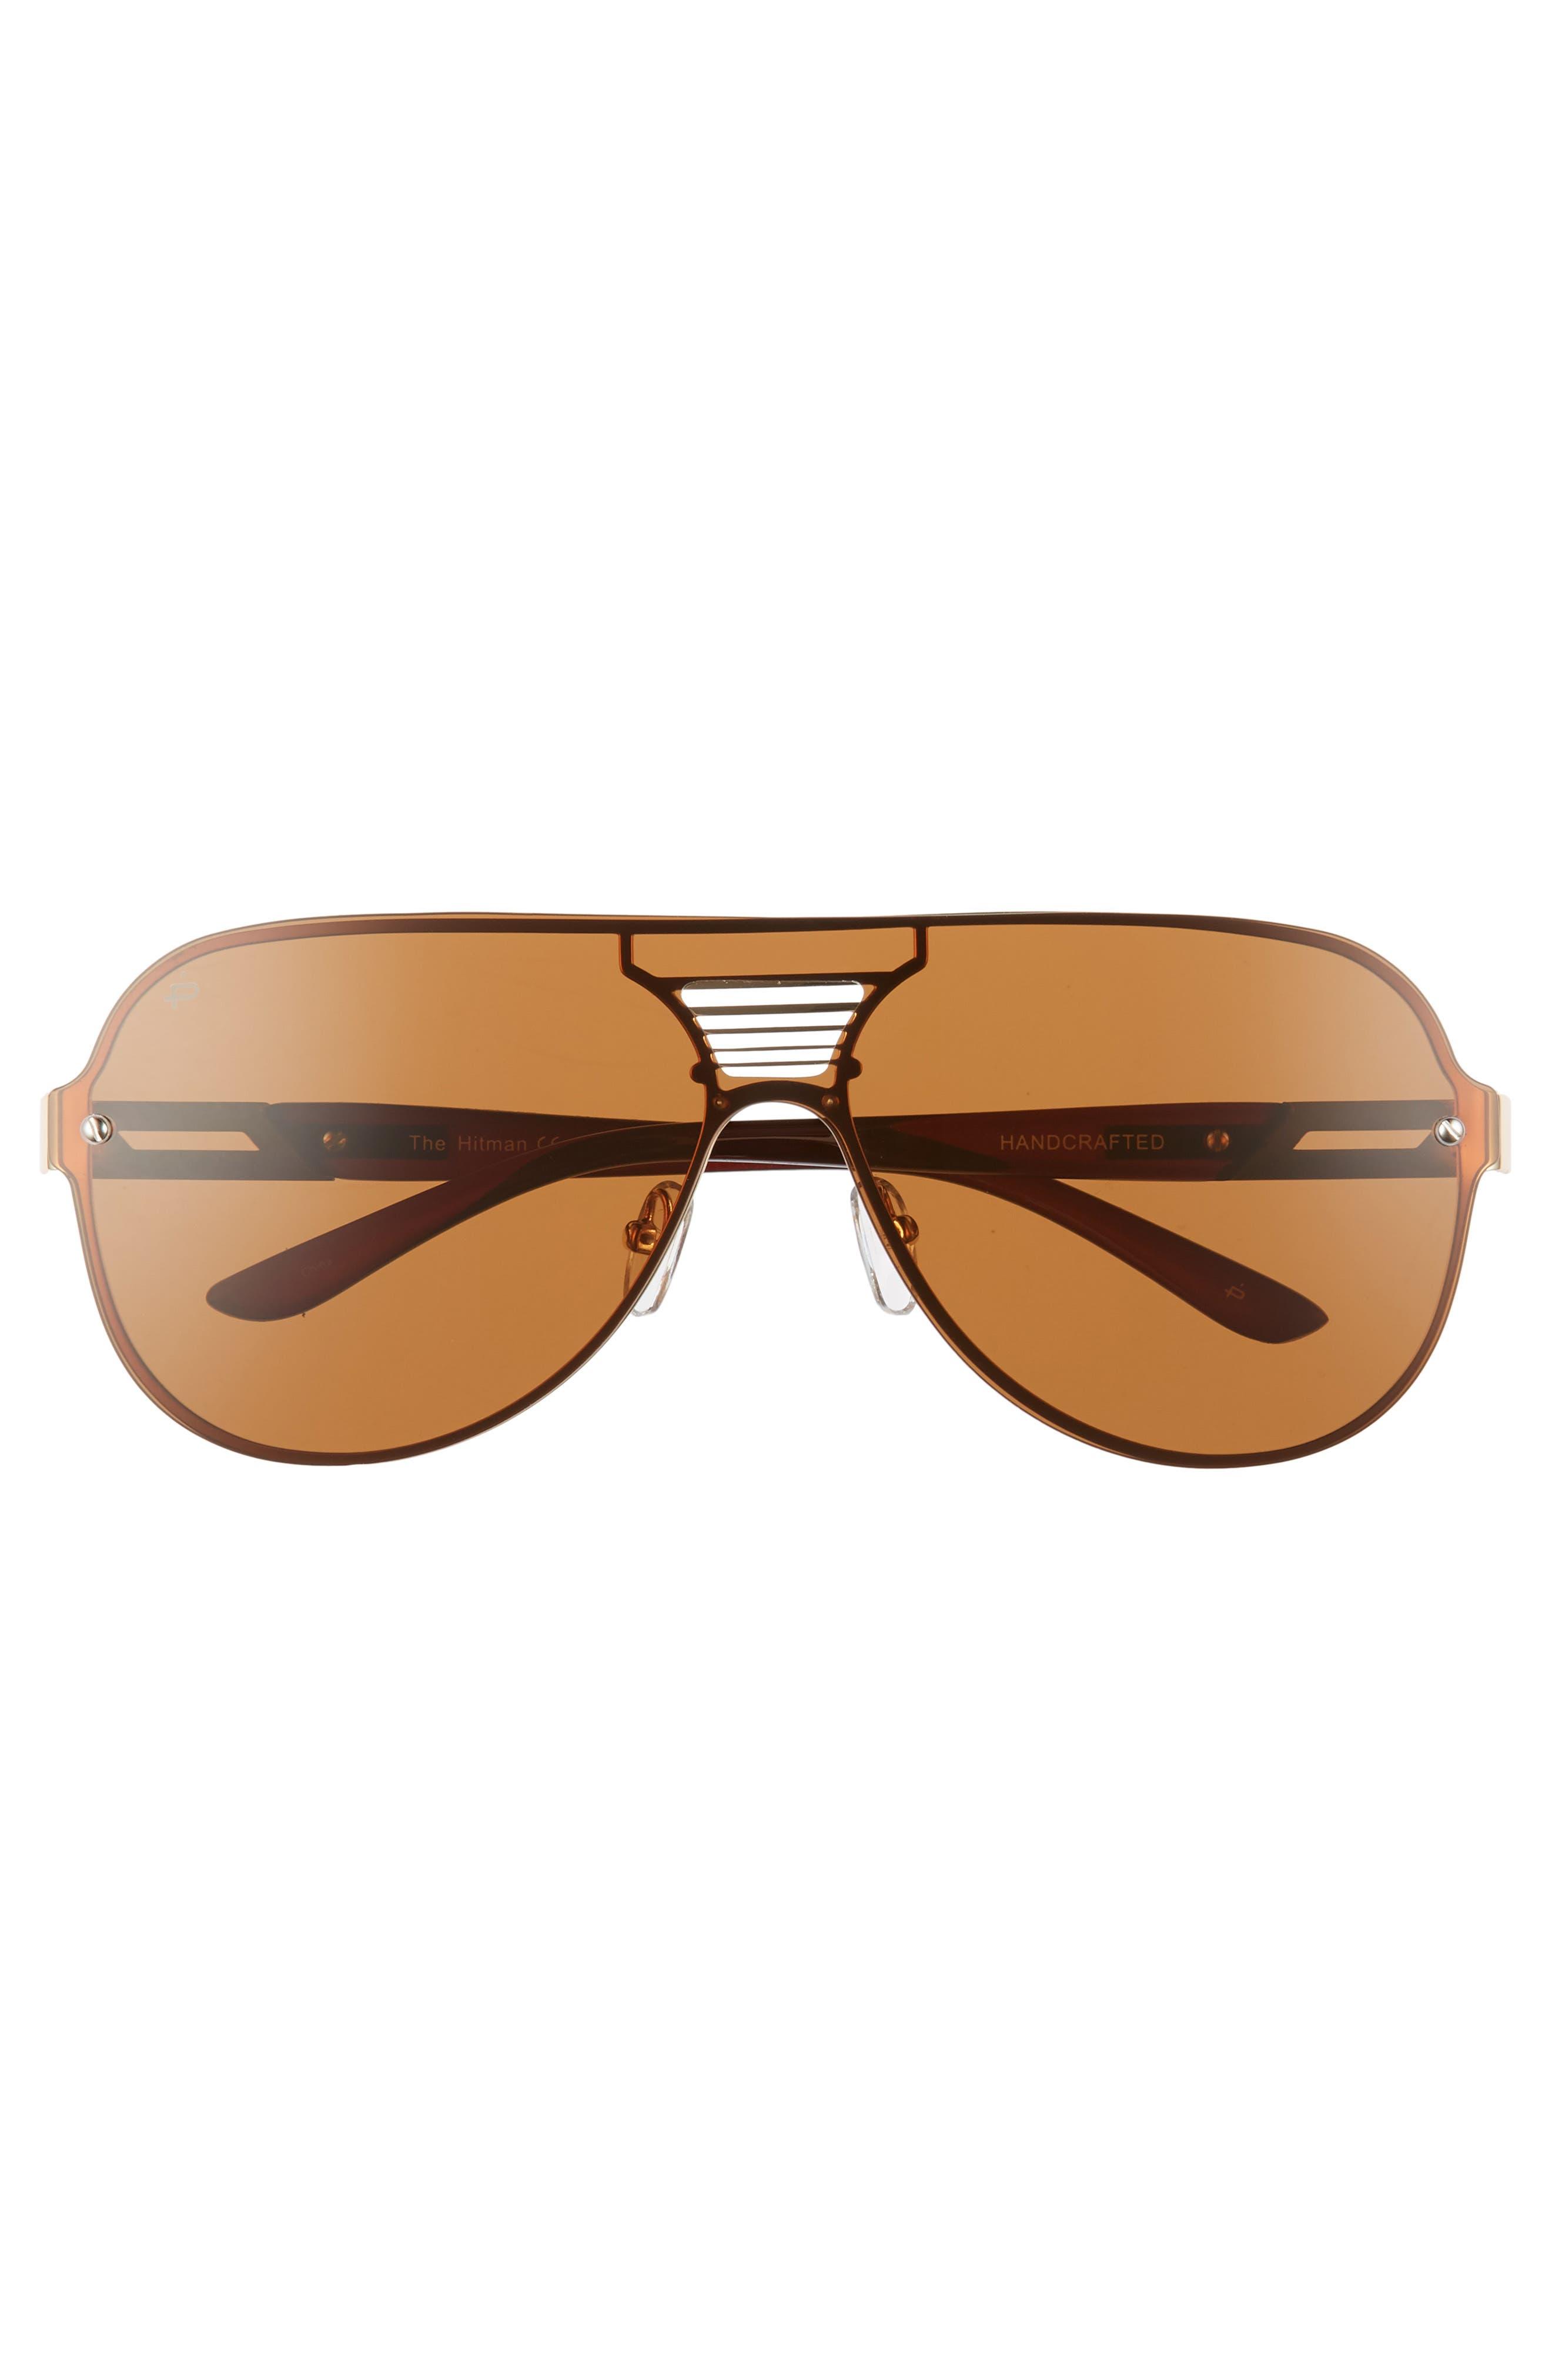 Privé Revaux The Hitman 63mm Polarized Oversize Aviator Sunglasses,                             Alternate thumbnail 2, color,                             Brown